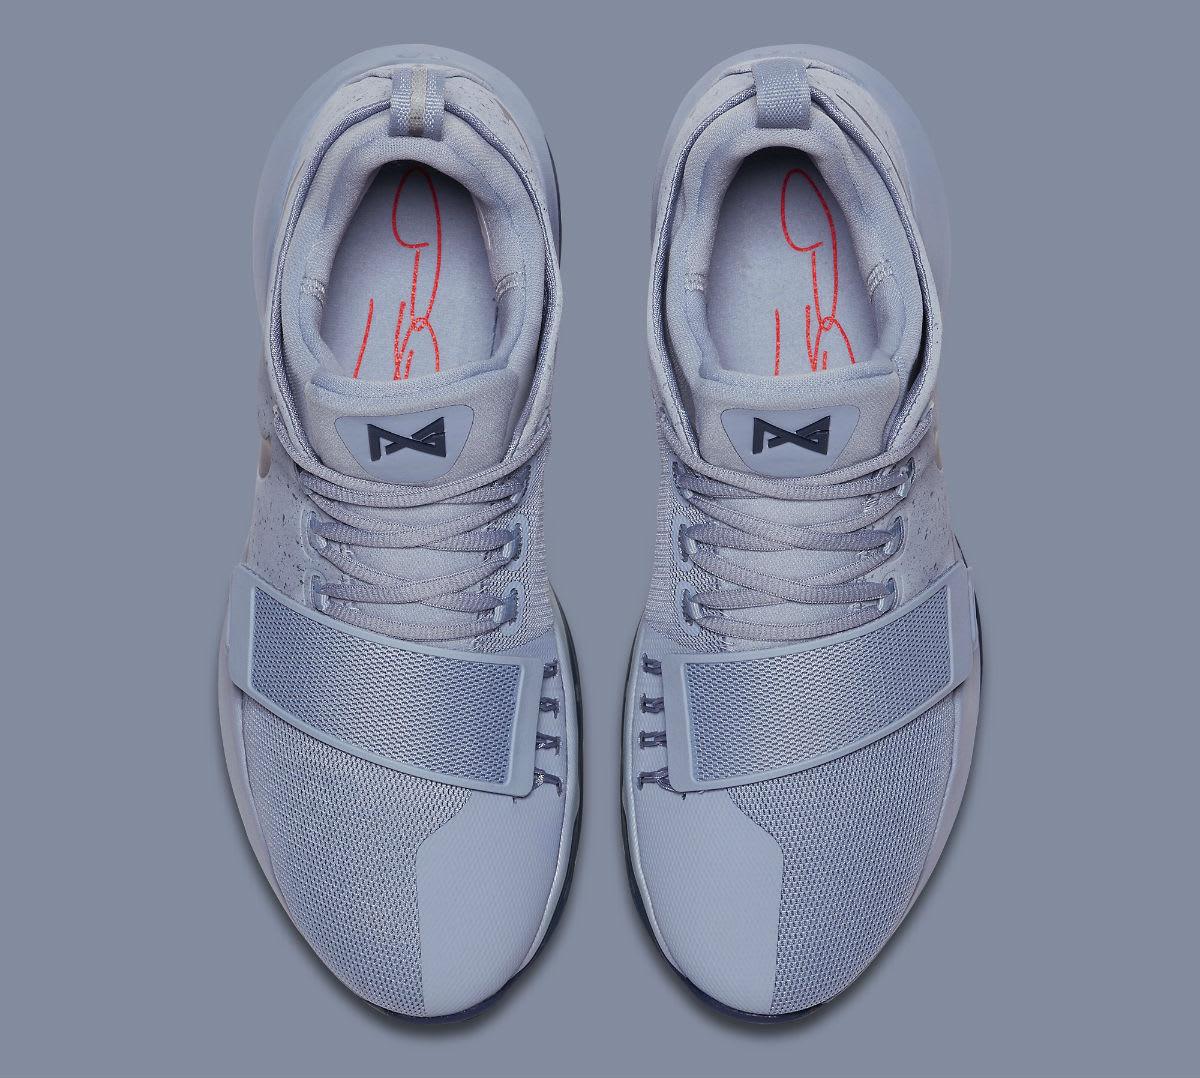 Nike PG 1 Glacier Grey Release Date Top 878627-044